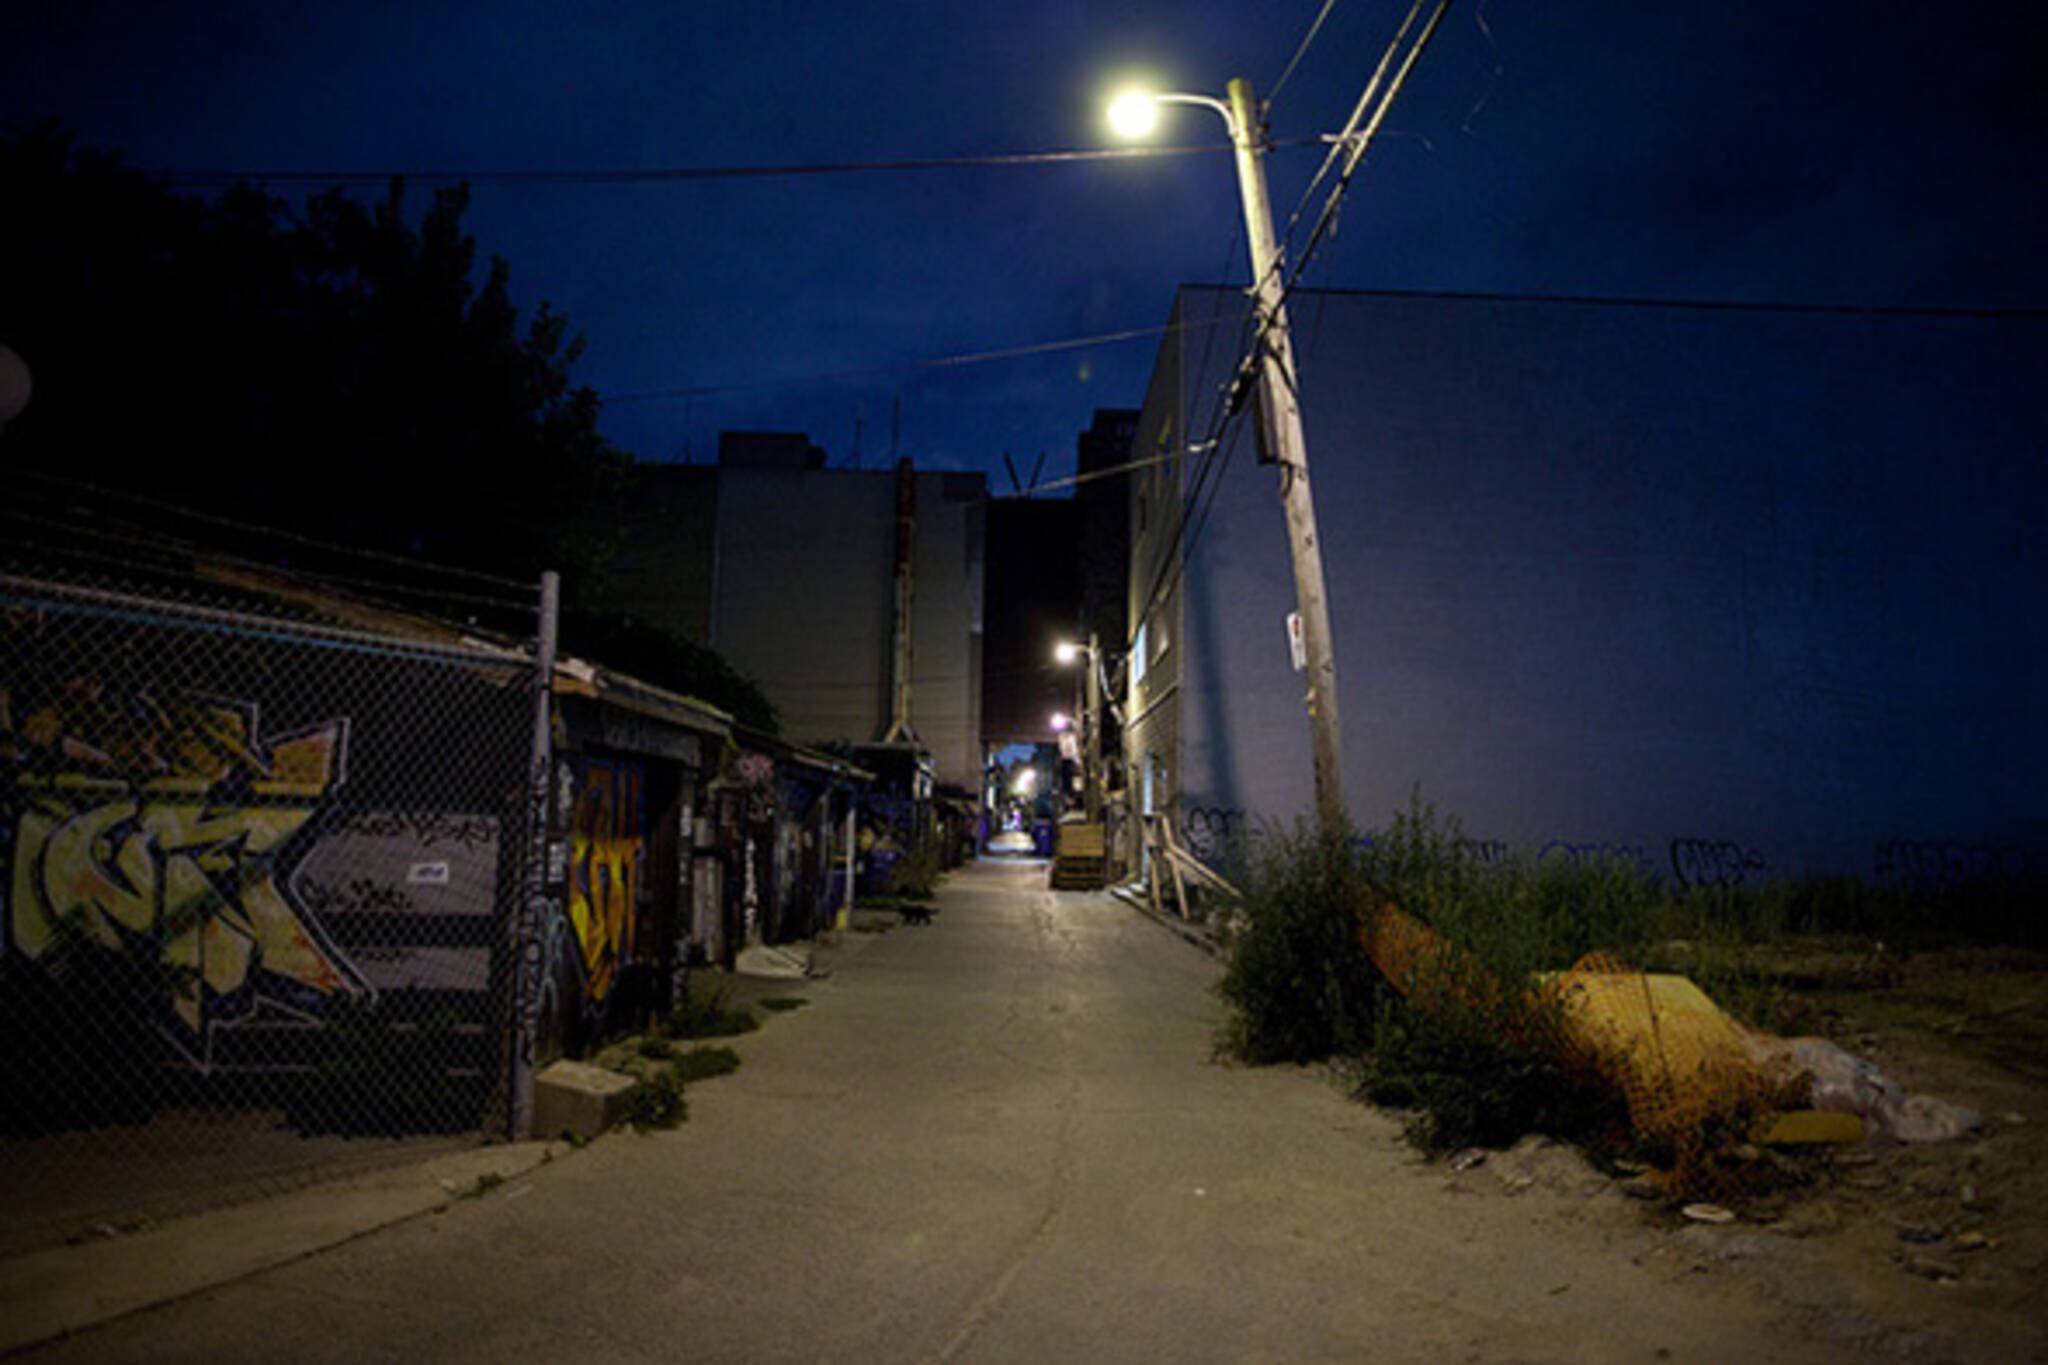 night, alley, dark